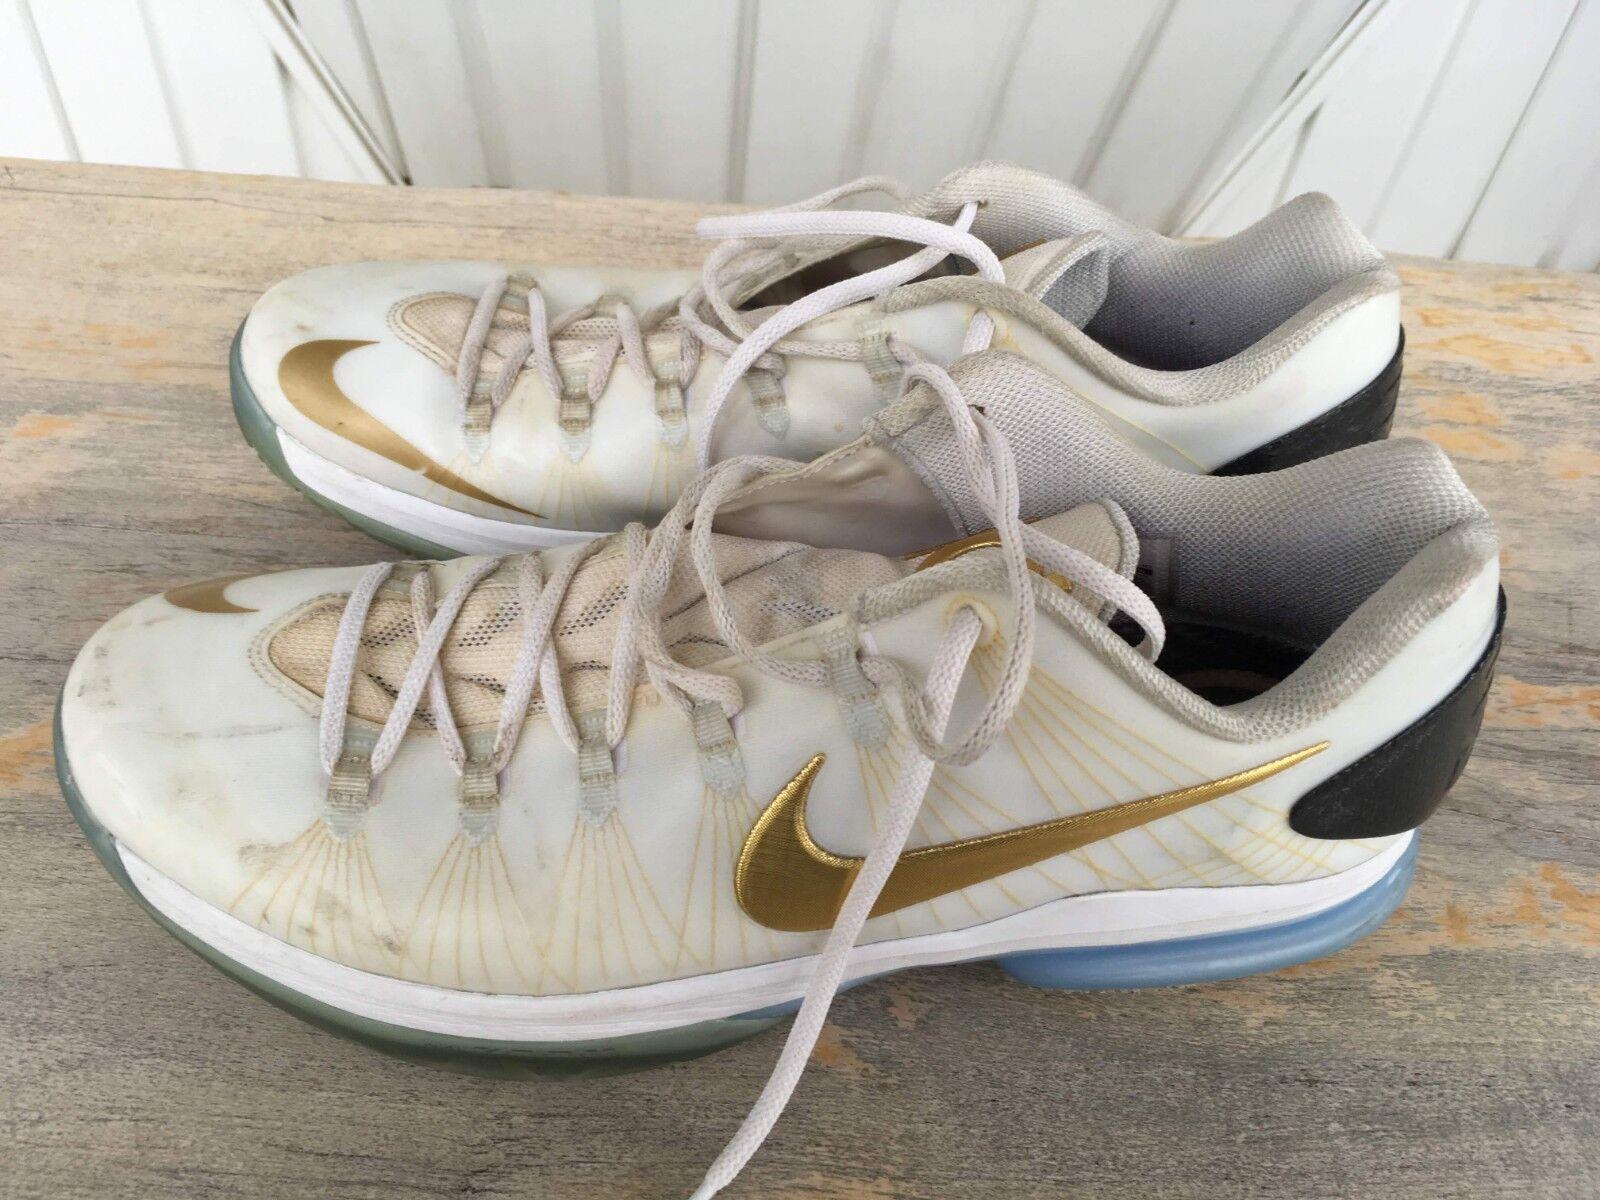 Nike KD V 5 Elite Low White-Metallic gold-Black Men's Size 12 (SKU  585385-100)